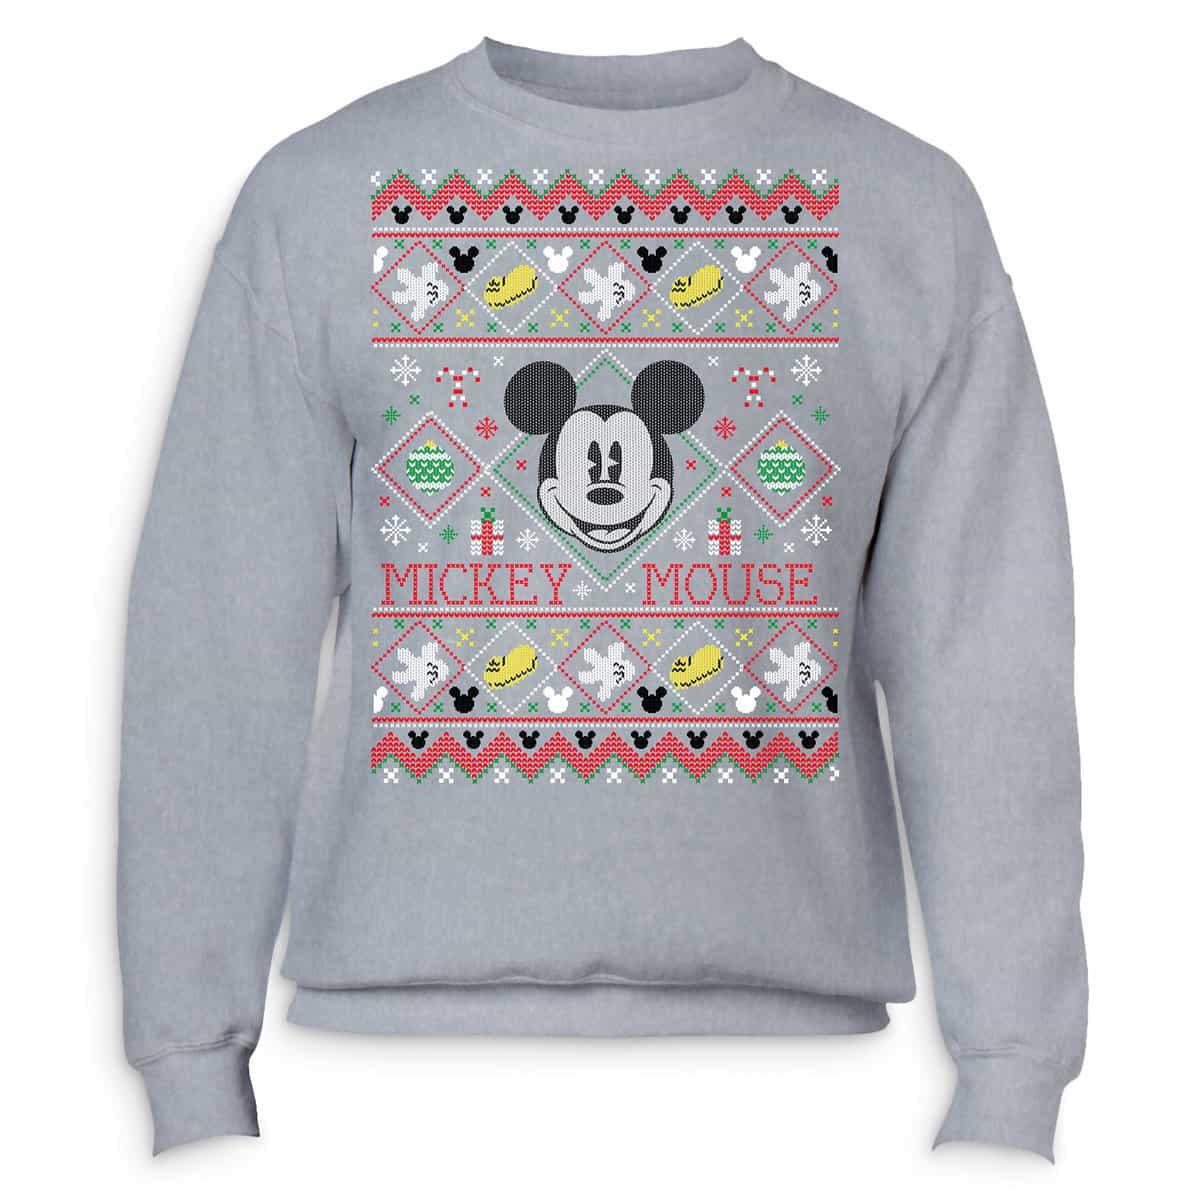 Kingdom Hearts Christmas Sweater - Limited Release Disney/Star Wars ...